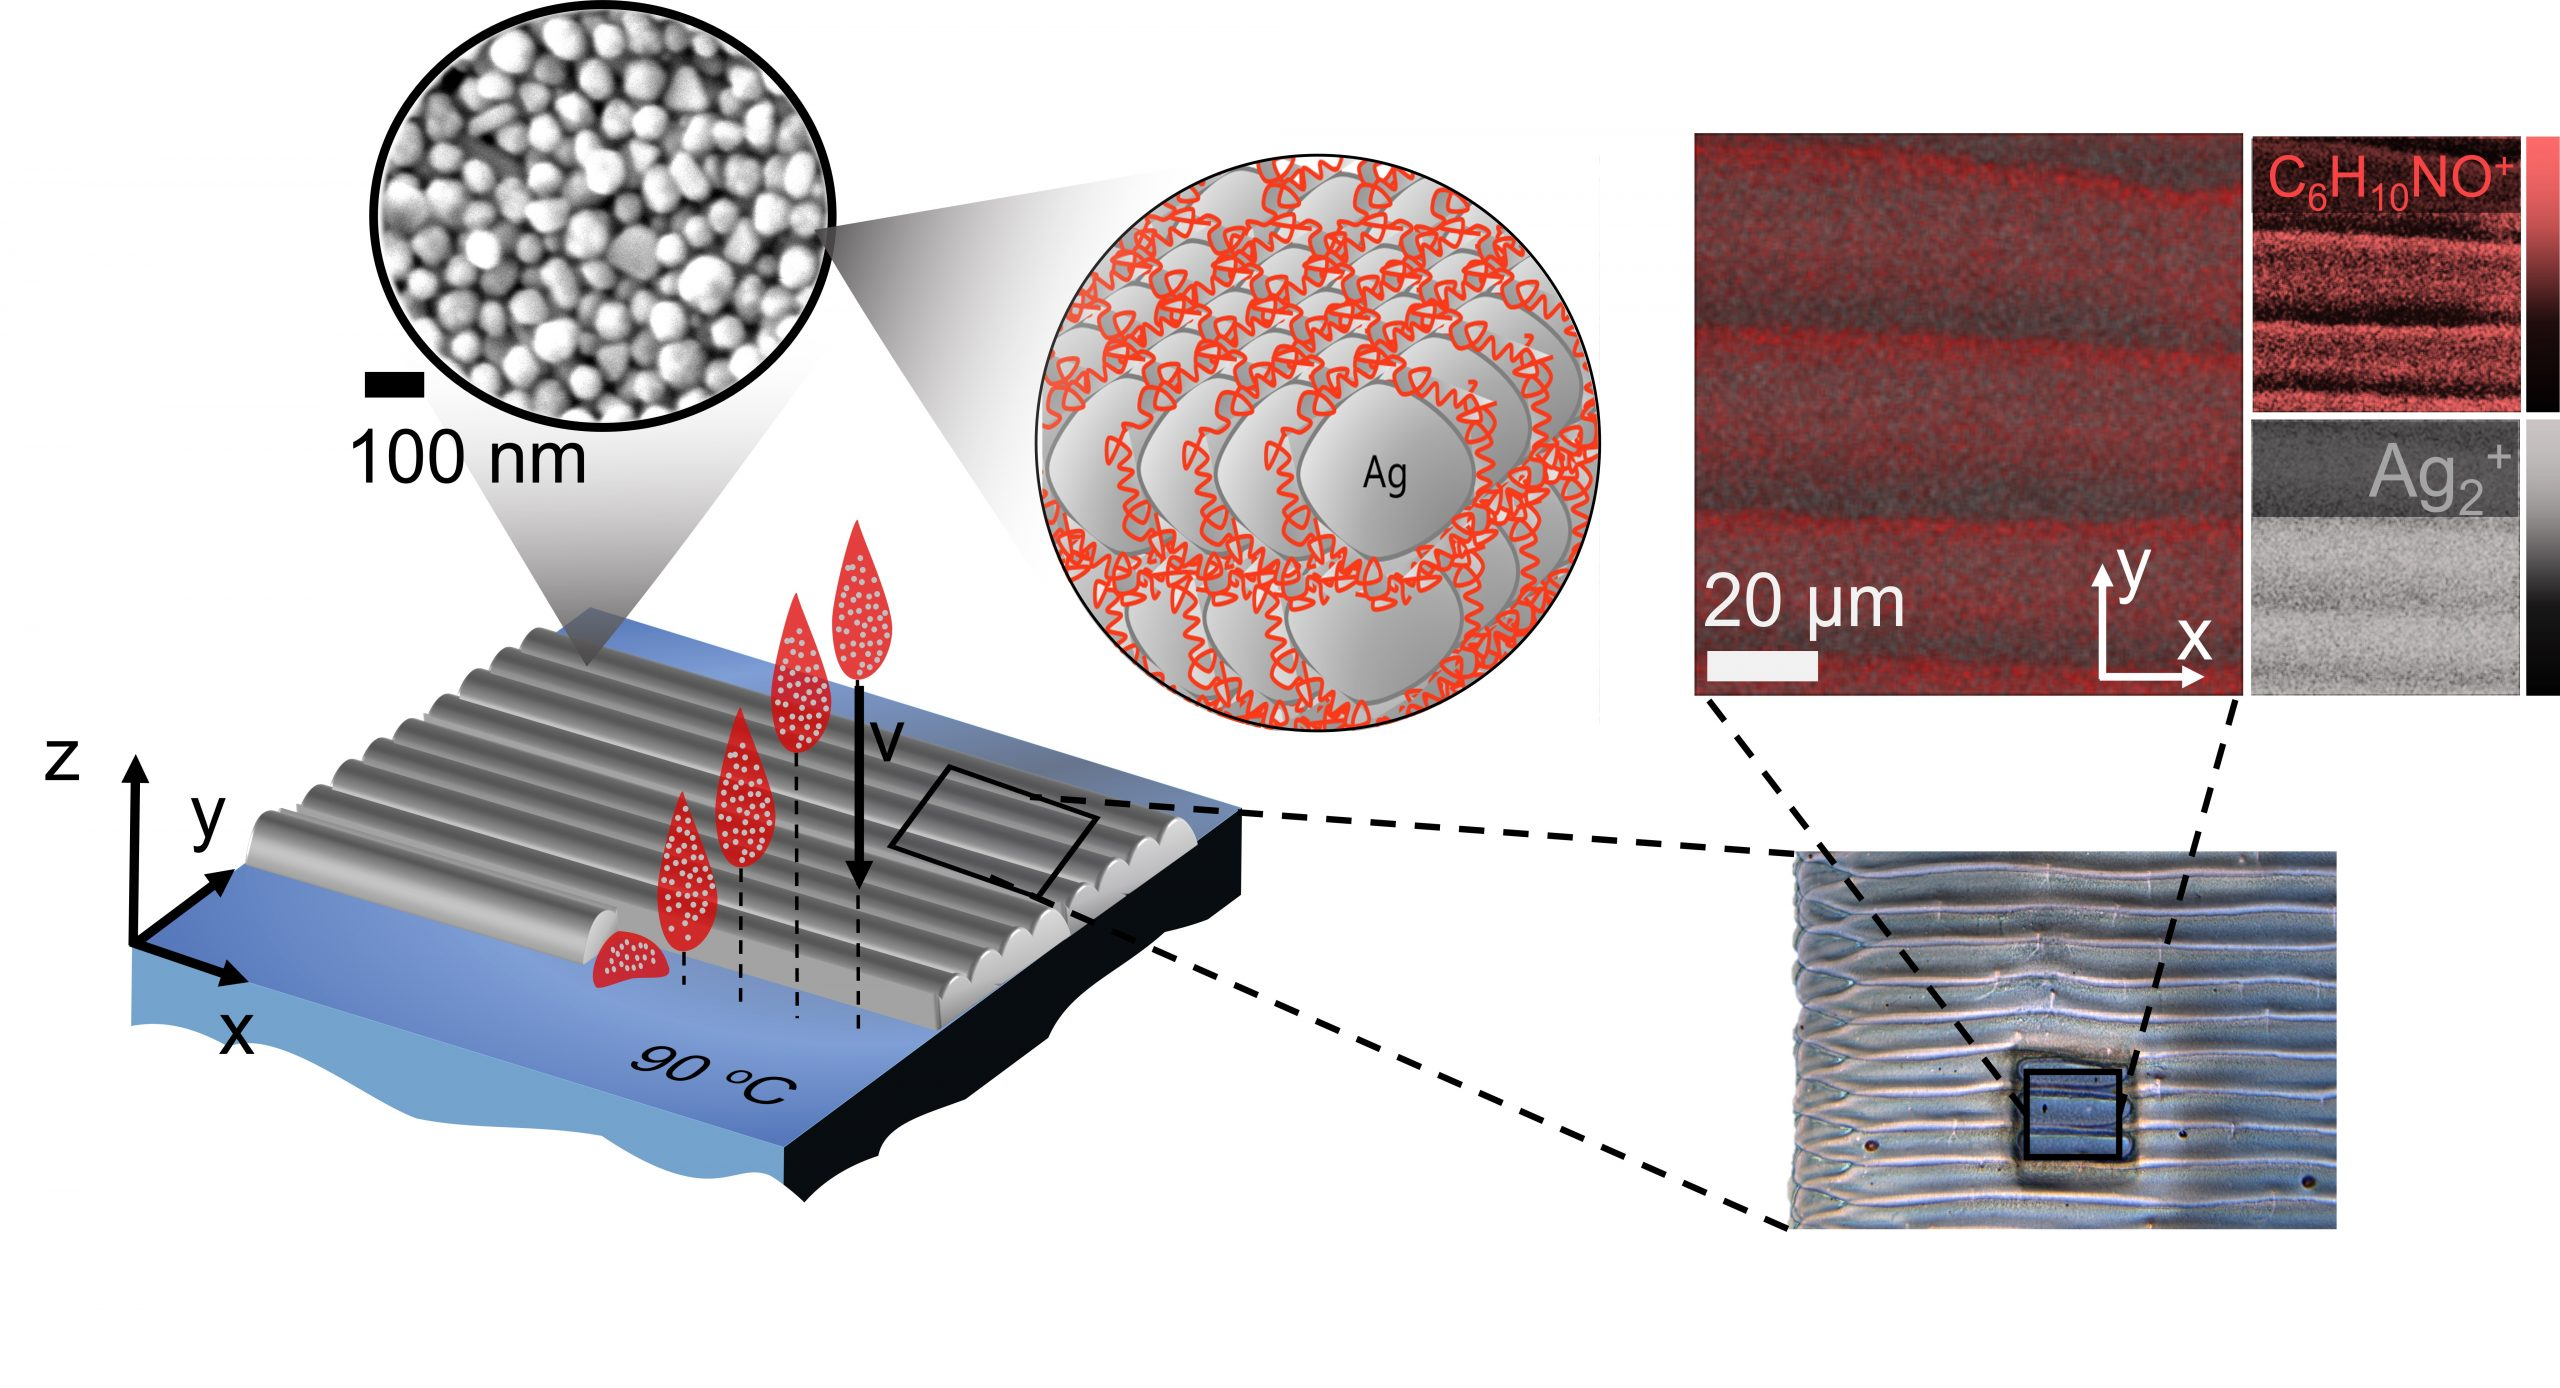 Inkjet printing silver nanoparticles and detection of polymer stabiliser. Image via Trindade et al.